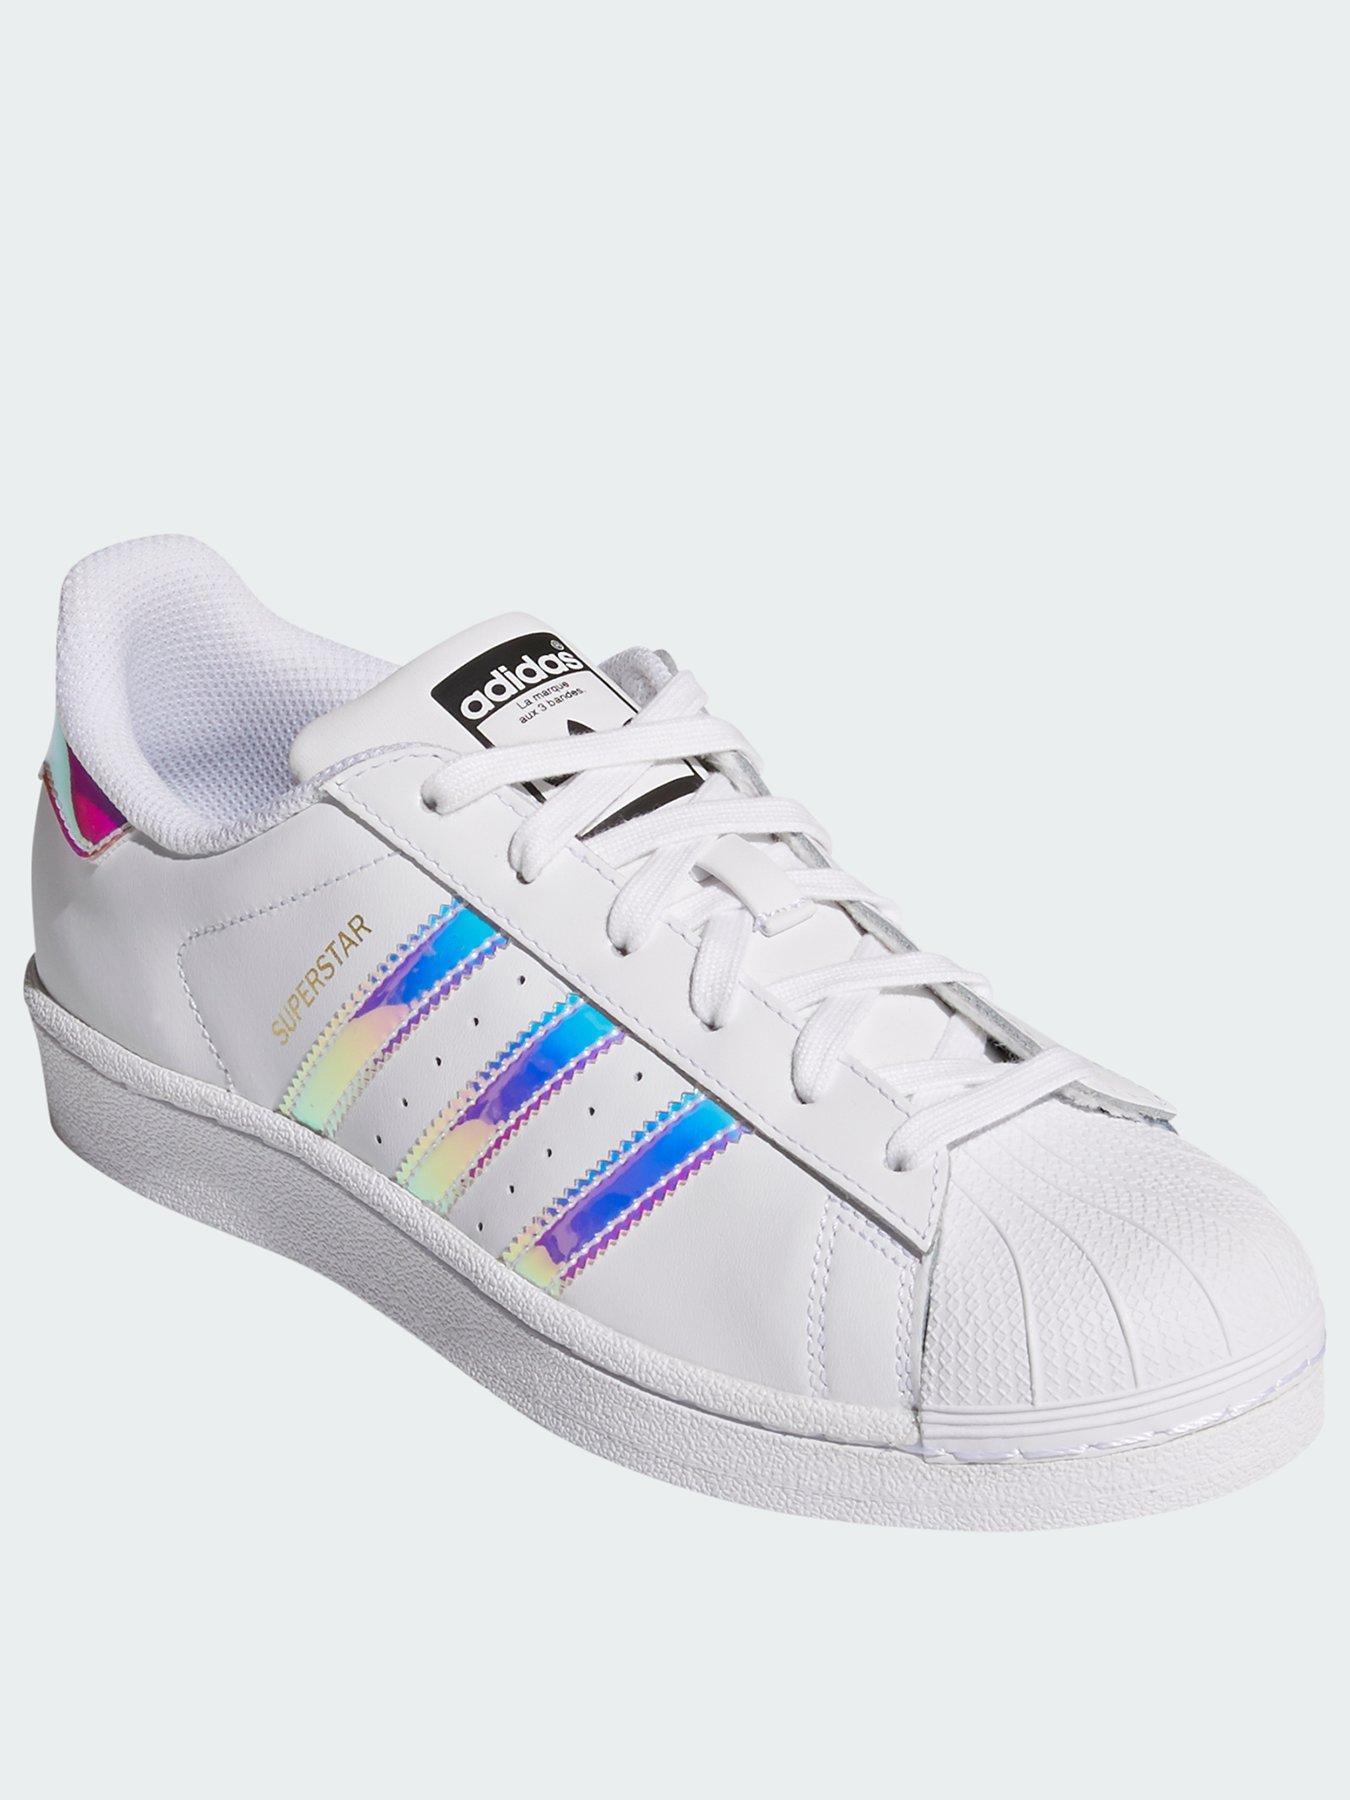 ladies adidas trainers size 3